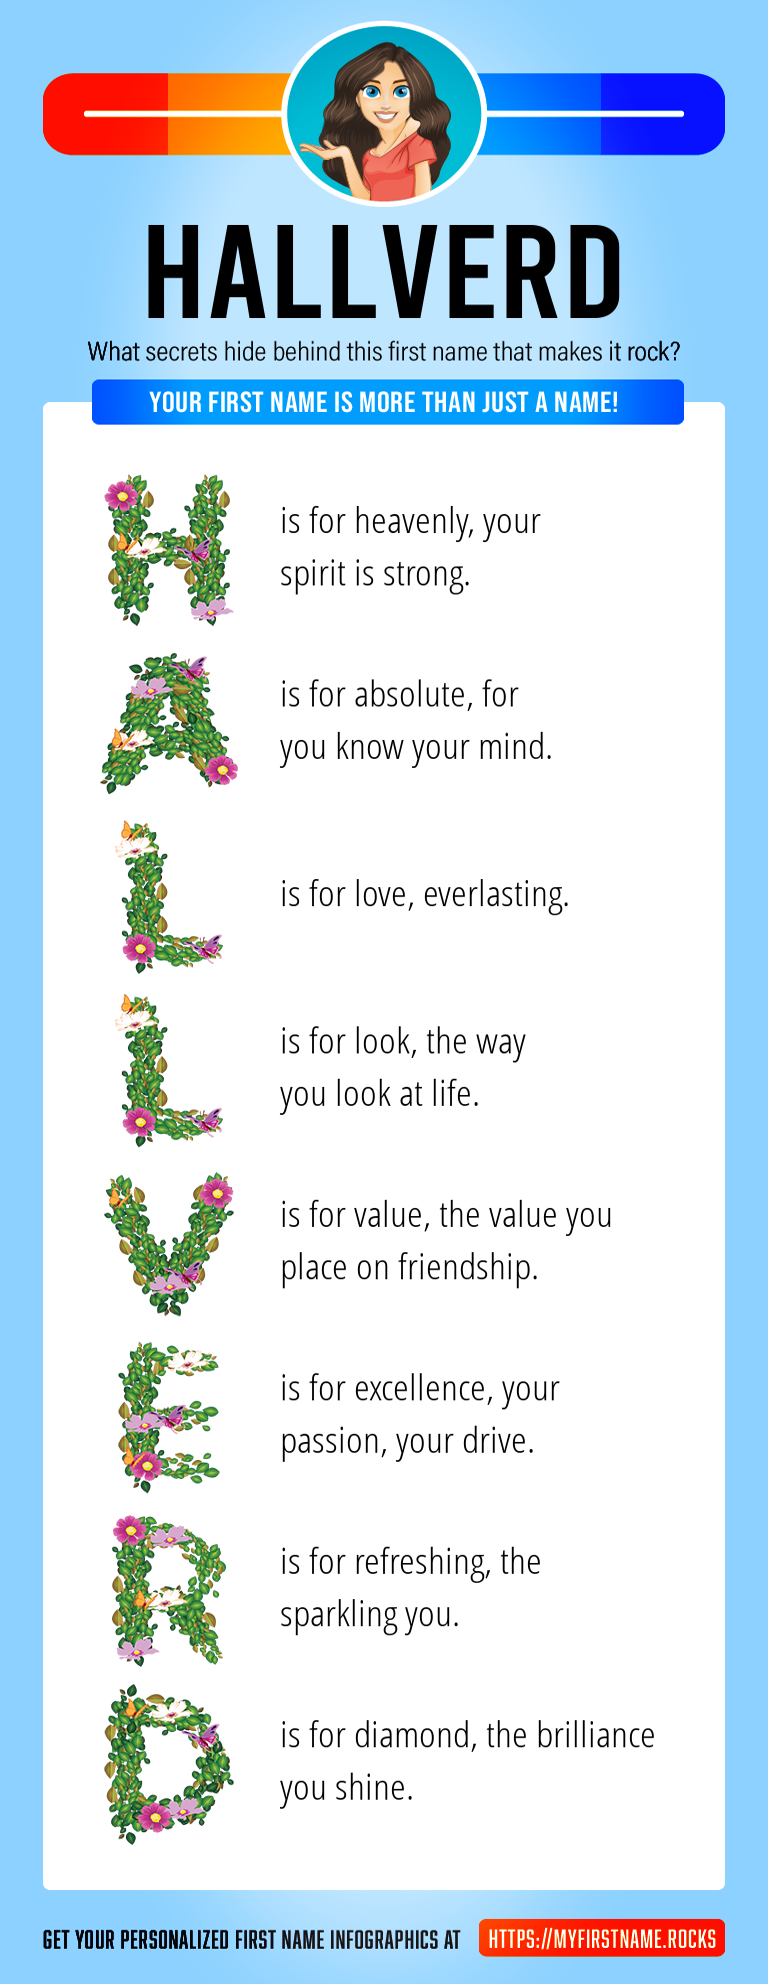 Hallverd Infographics